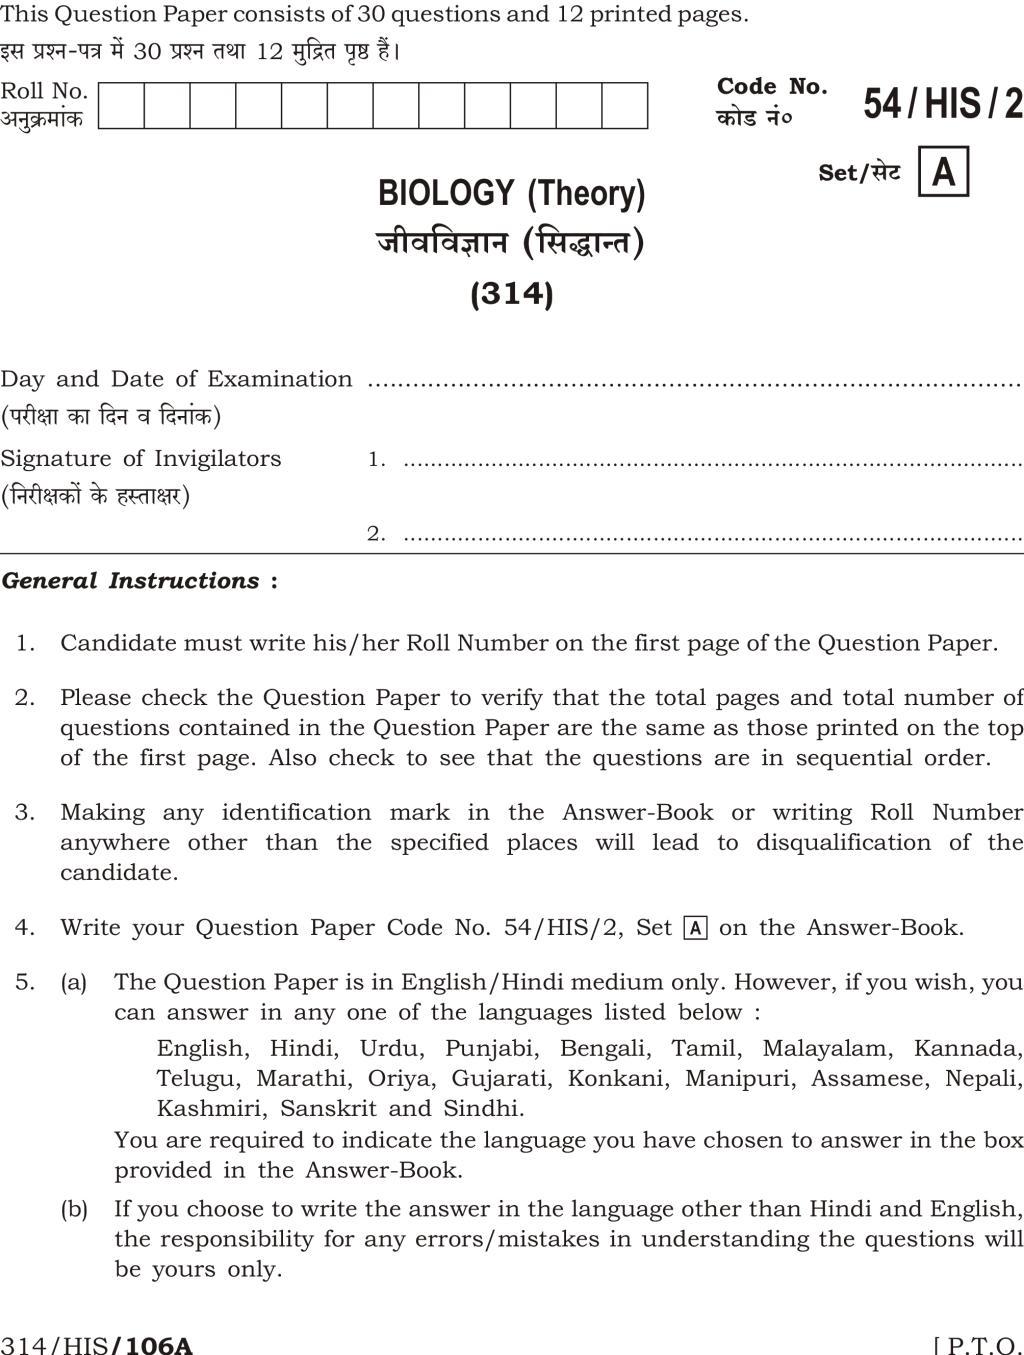 NIOS Class 12 Question Paper Apr 2017 - Biology - Page 1